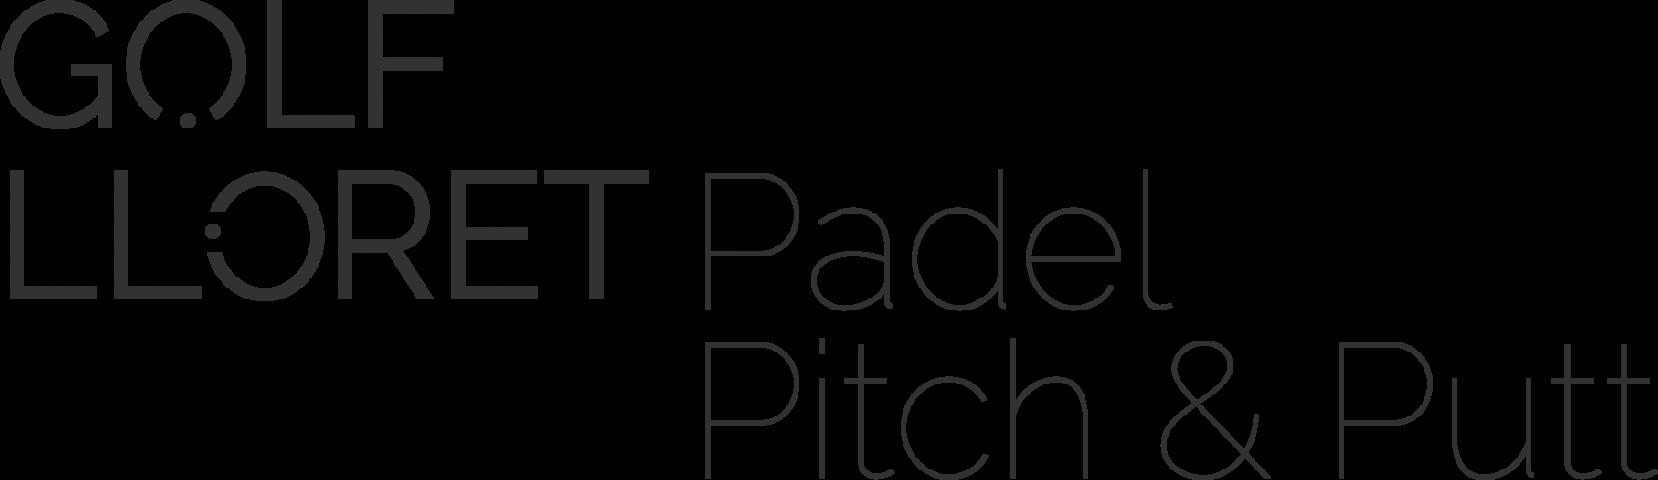 GOLF LLORET PITCH&PUTT - logo